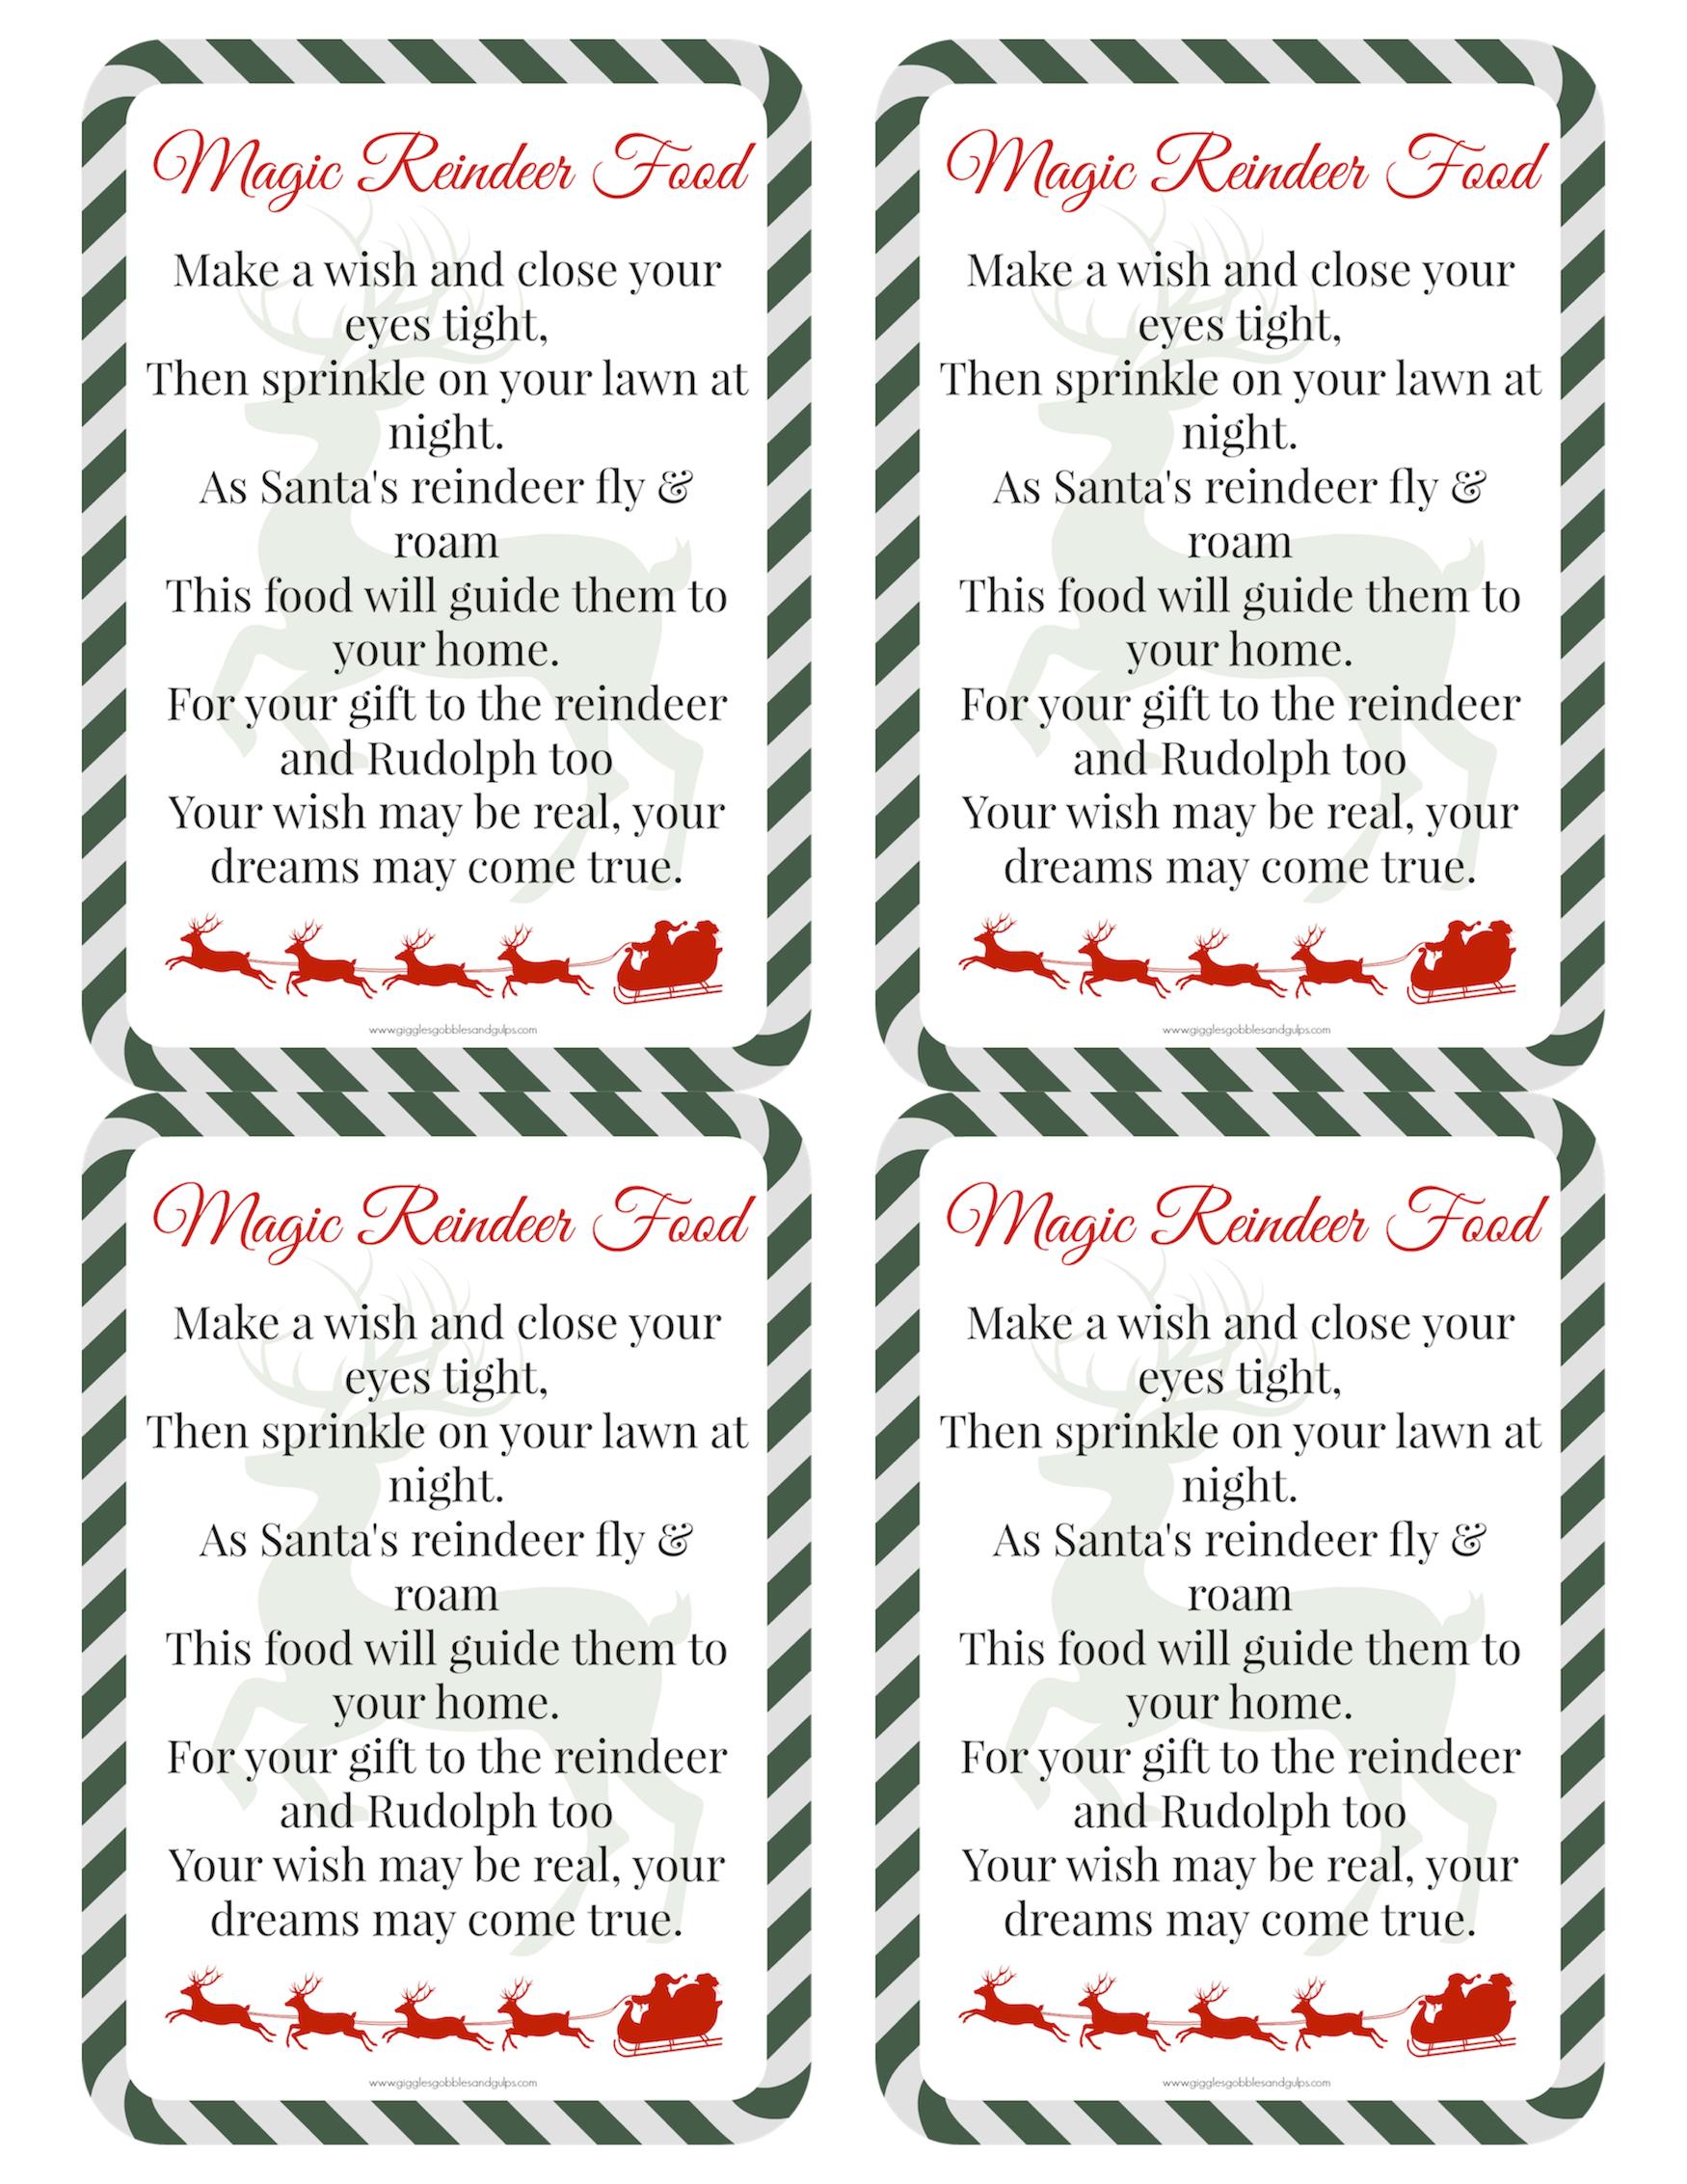 picture about Reindeer Food Printable known as Magic Reindeer Foodstuff Recipe